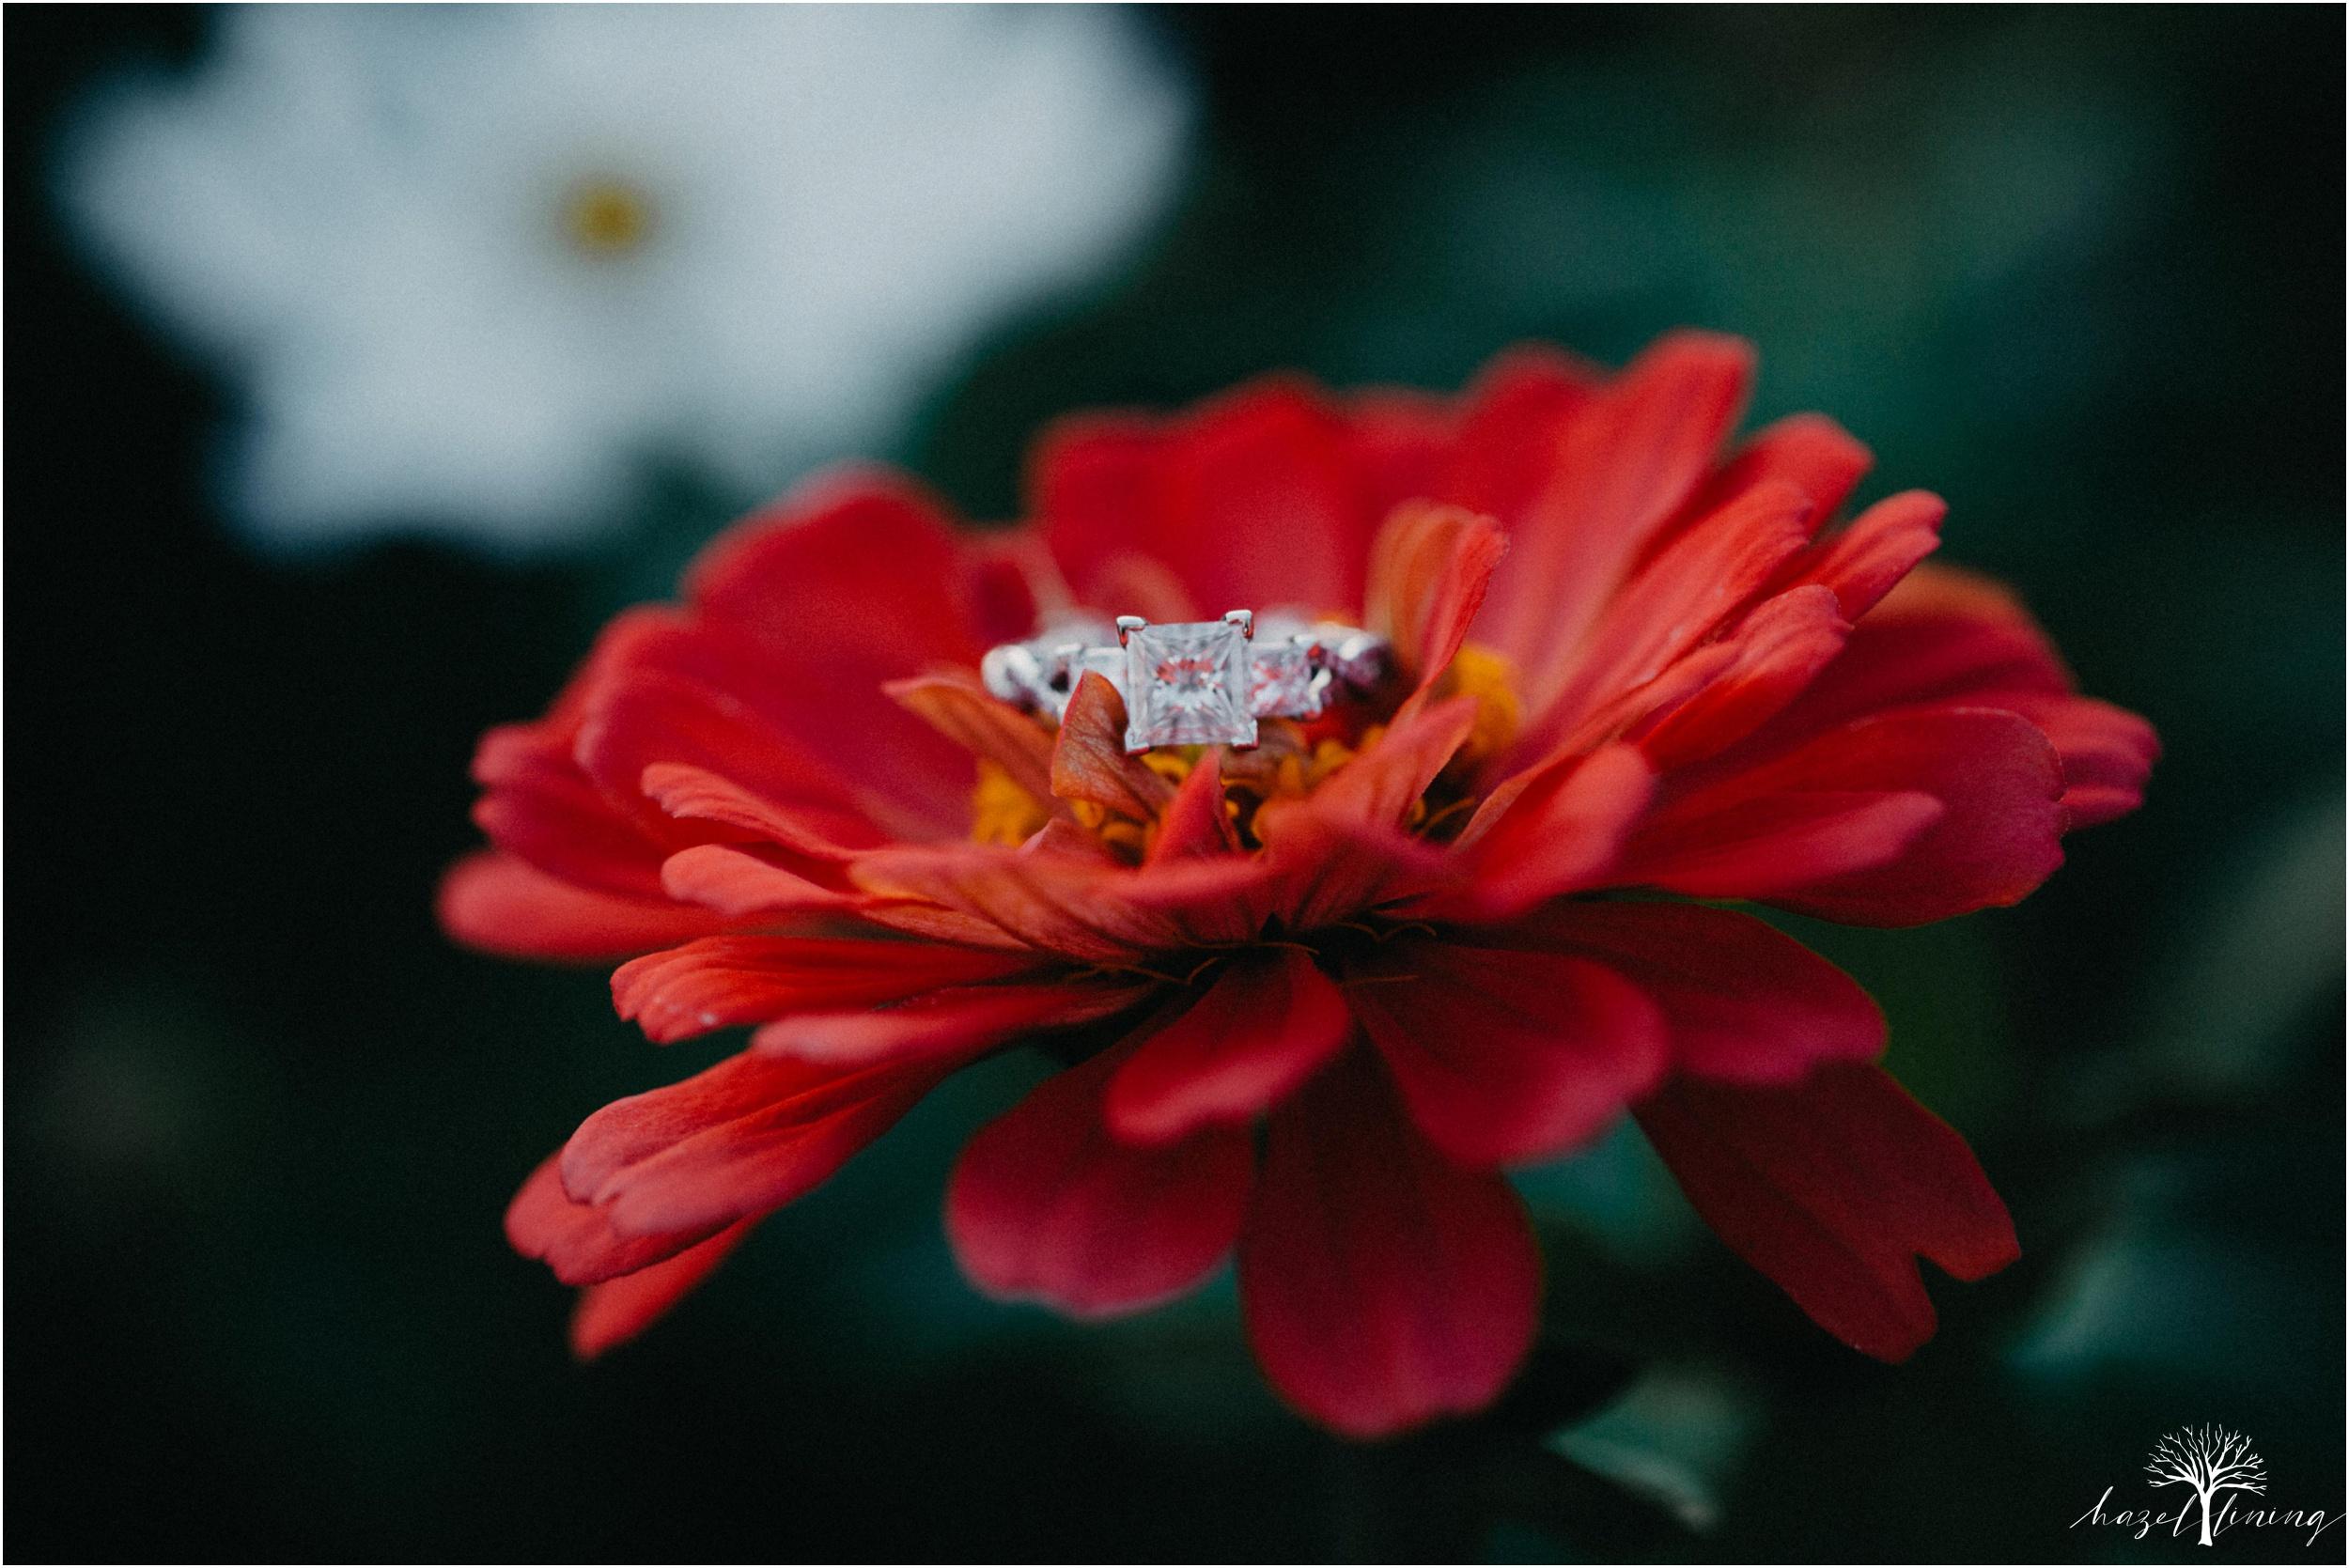 rachel-warner-chris-niedrist-the-farm-bakery-and-events-quakertown-pa-summer-engagement-hazel-lining-photography-destination-elopement-wedding-engagement-photography_0029.jpg